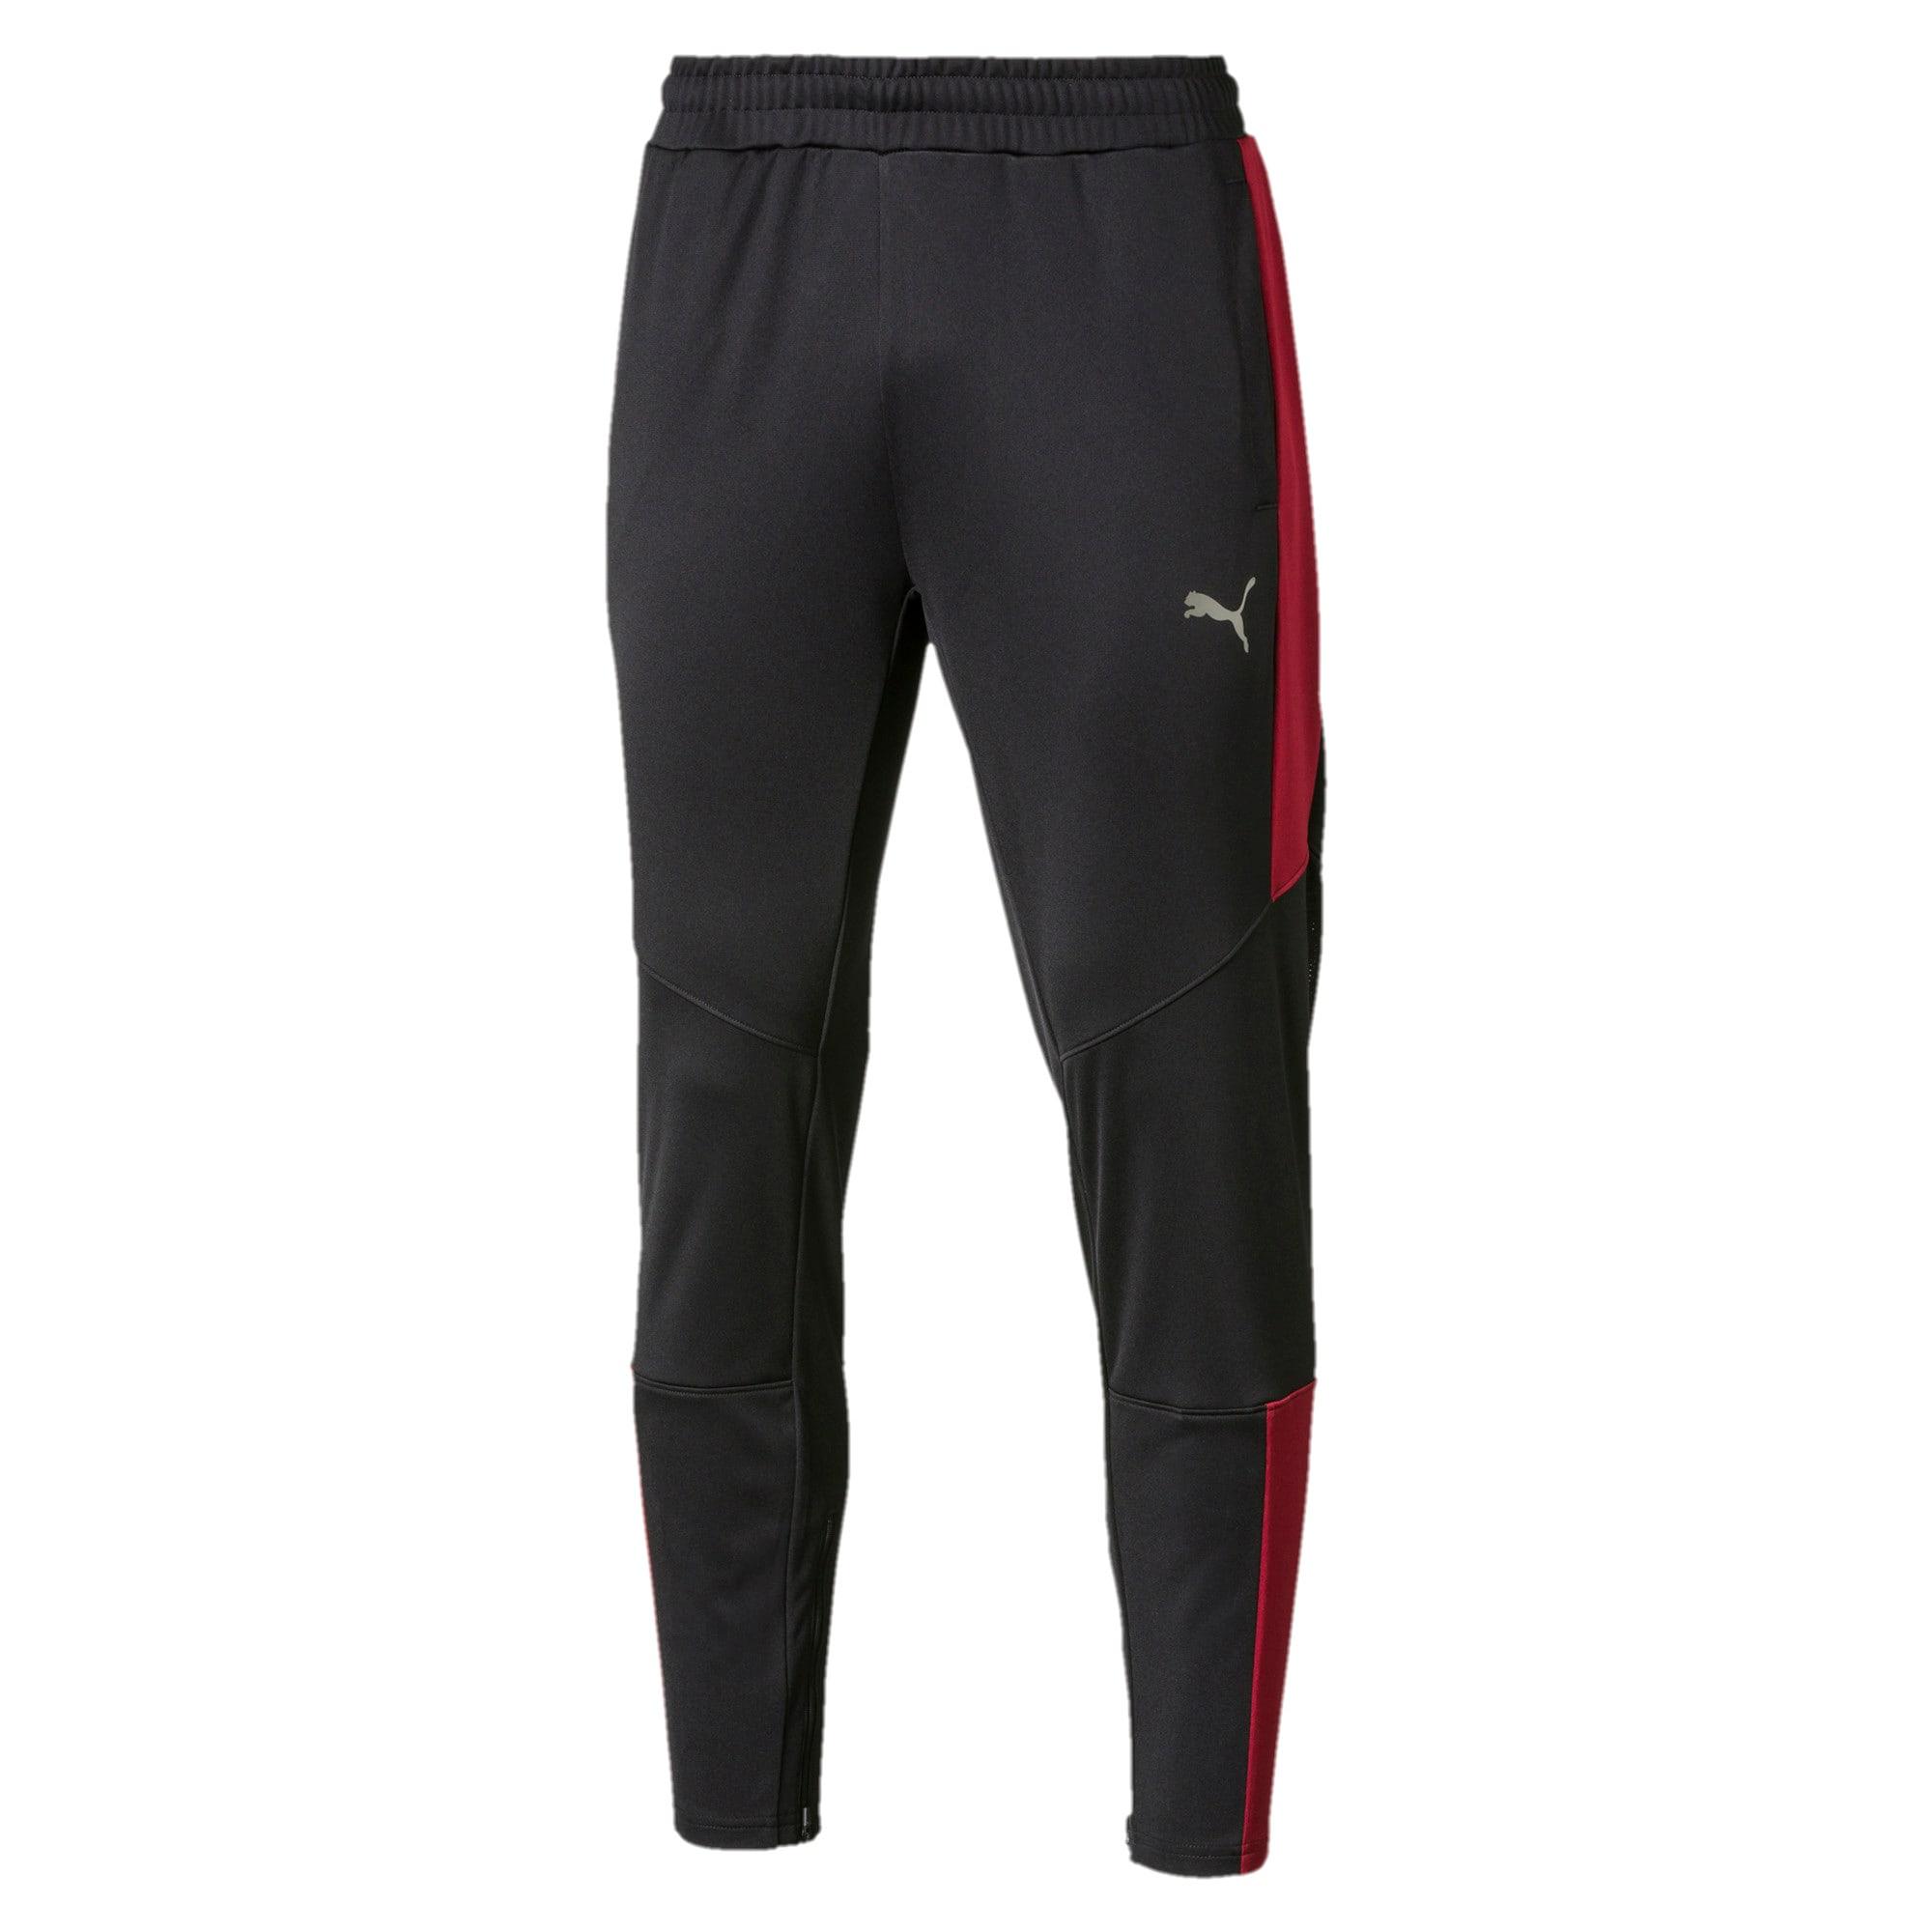 Thumbnail 1 of PUMA Blaster Men's Pants, Puma Black-Rhubarb, medium